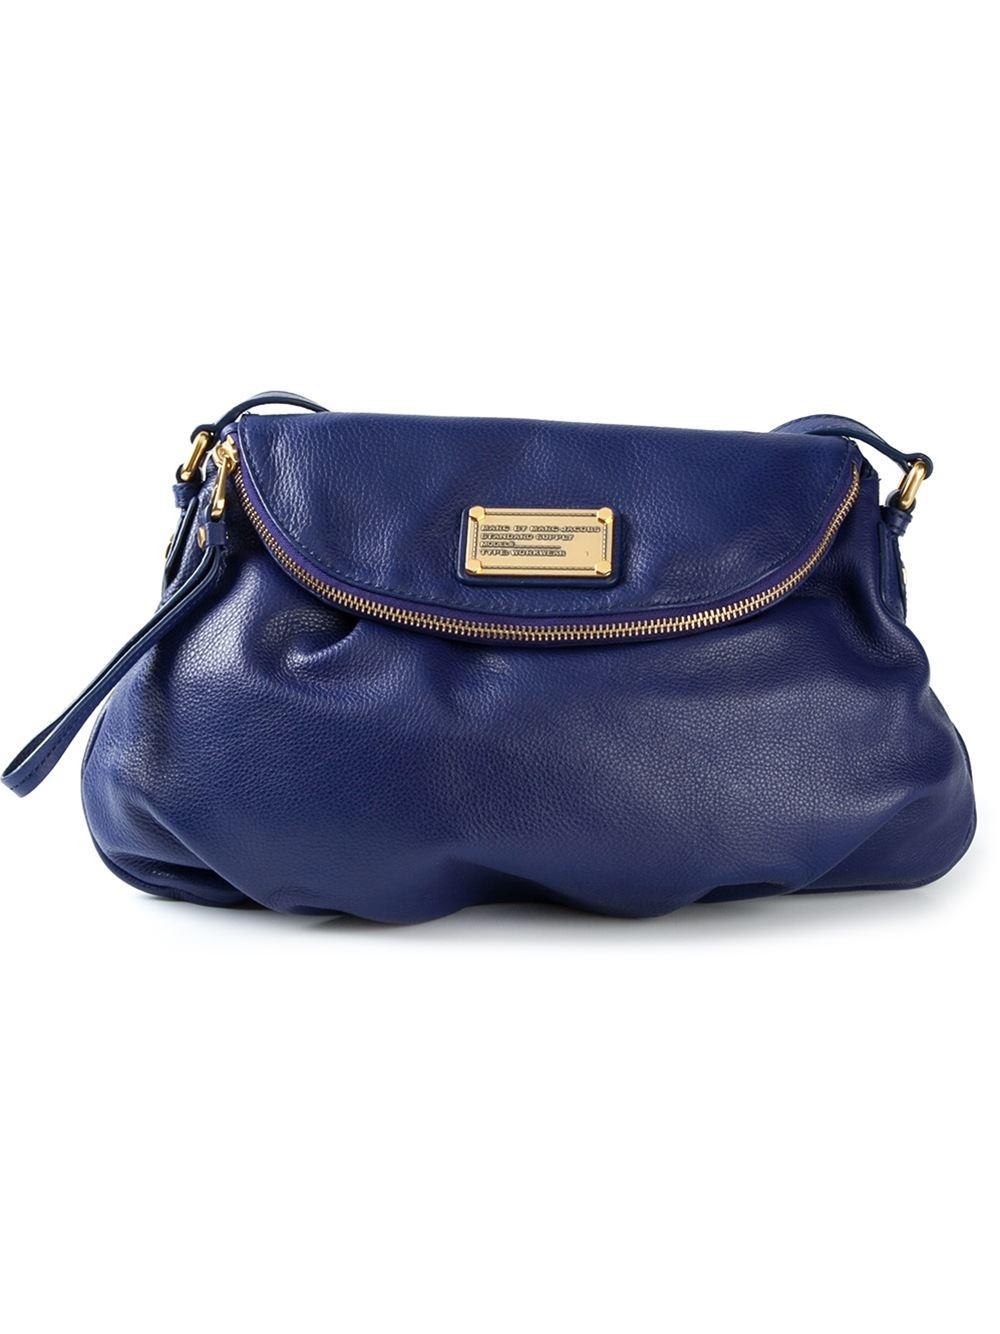 e524493a8a5a Lyst - Marc By Marc Jacobs  Classic Q Natasha  Cross Body Bag in Blue